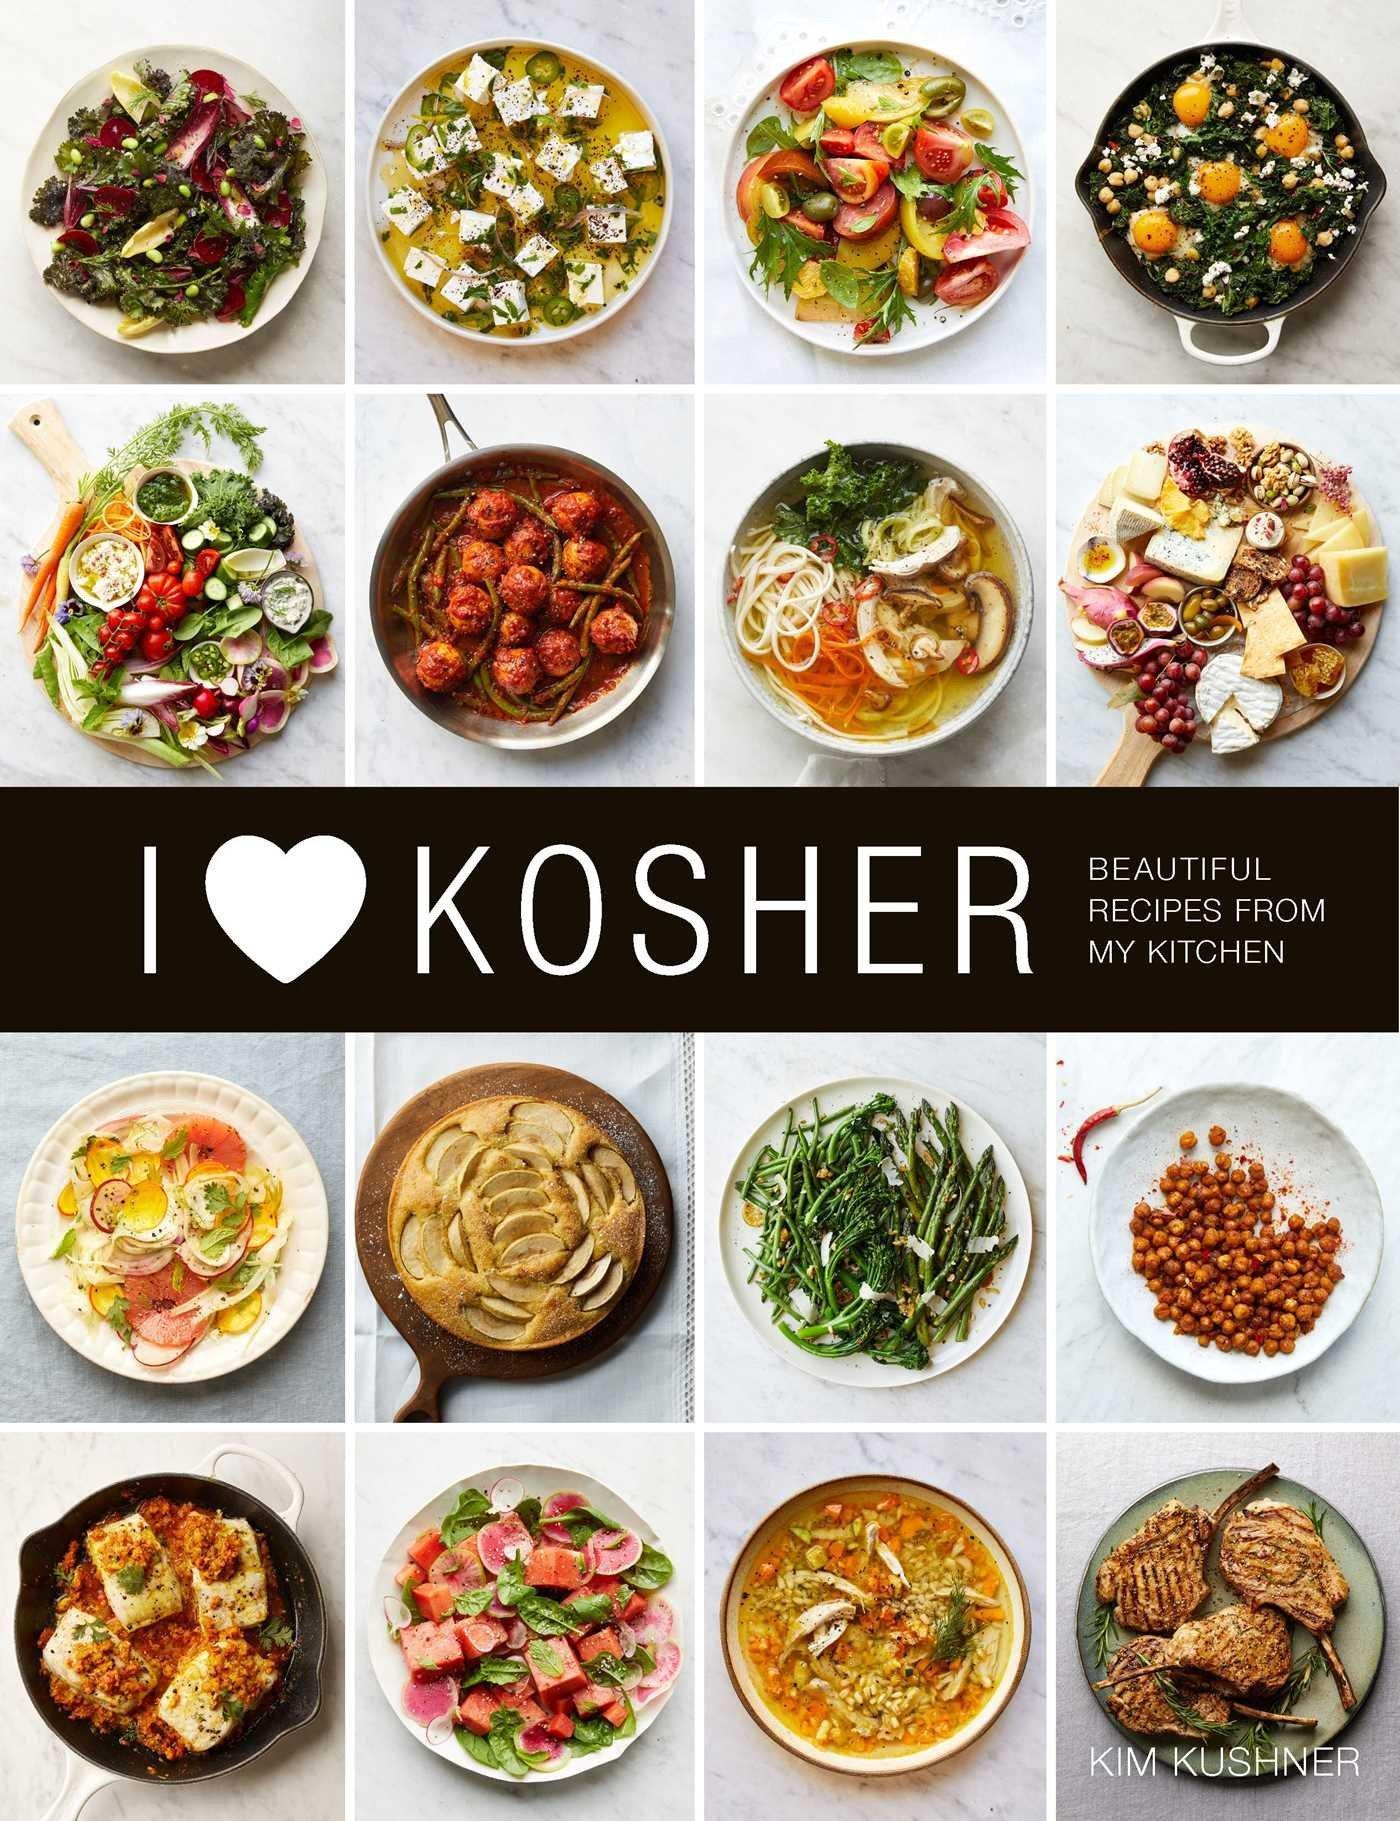 Heart Kosher Beautiful Recipes Kitchen